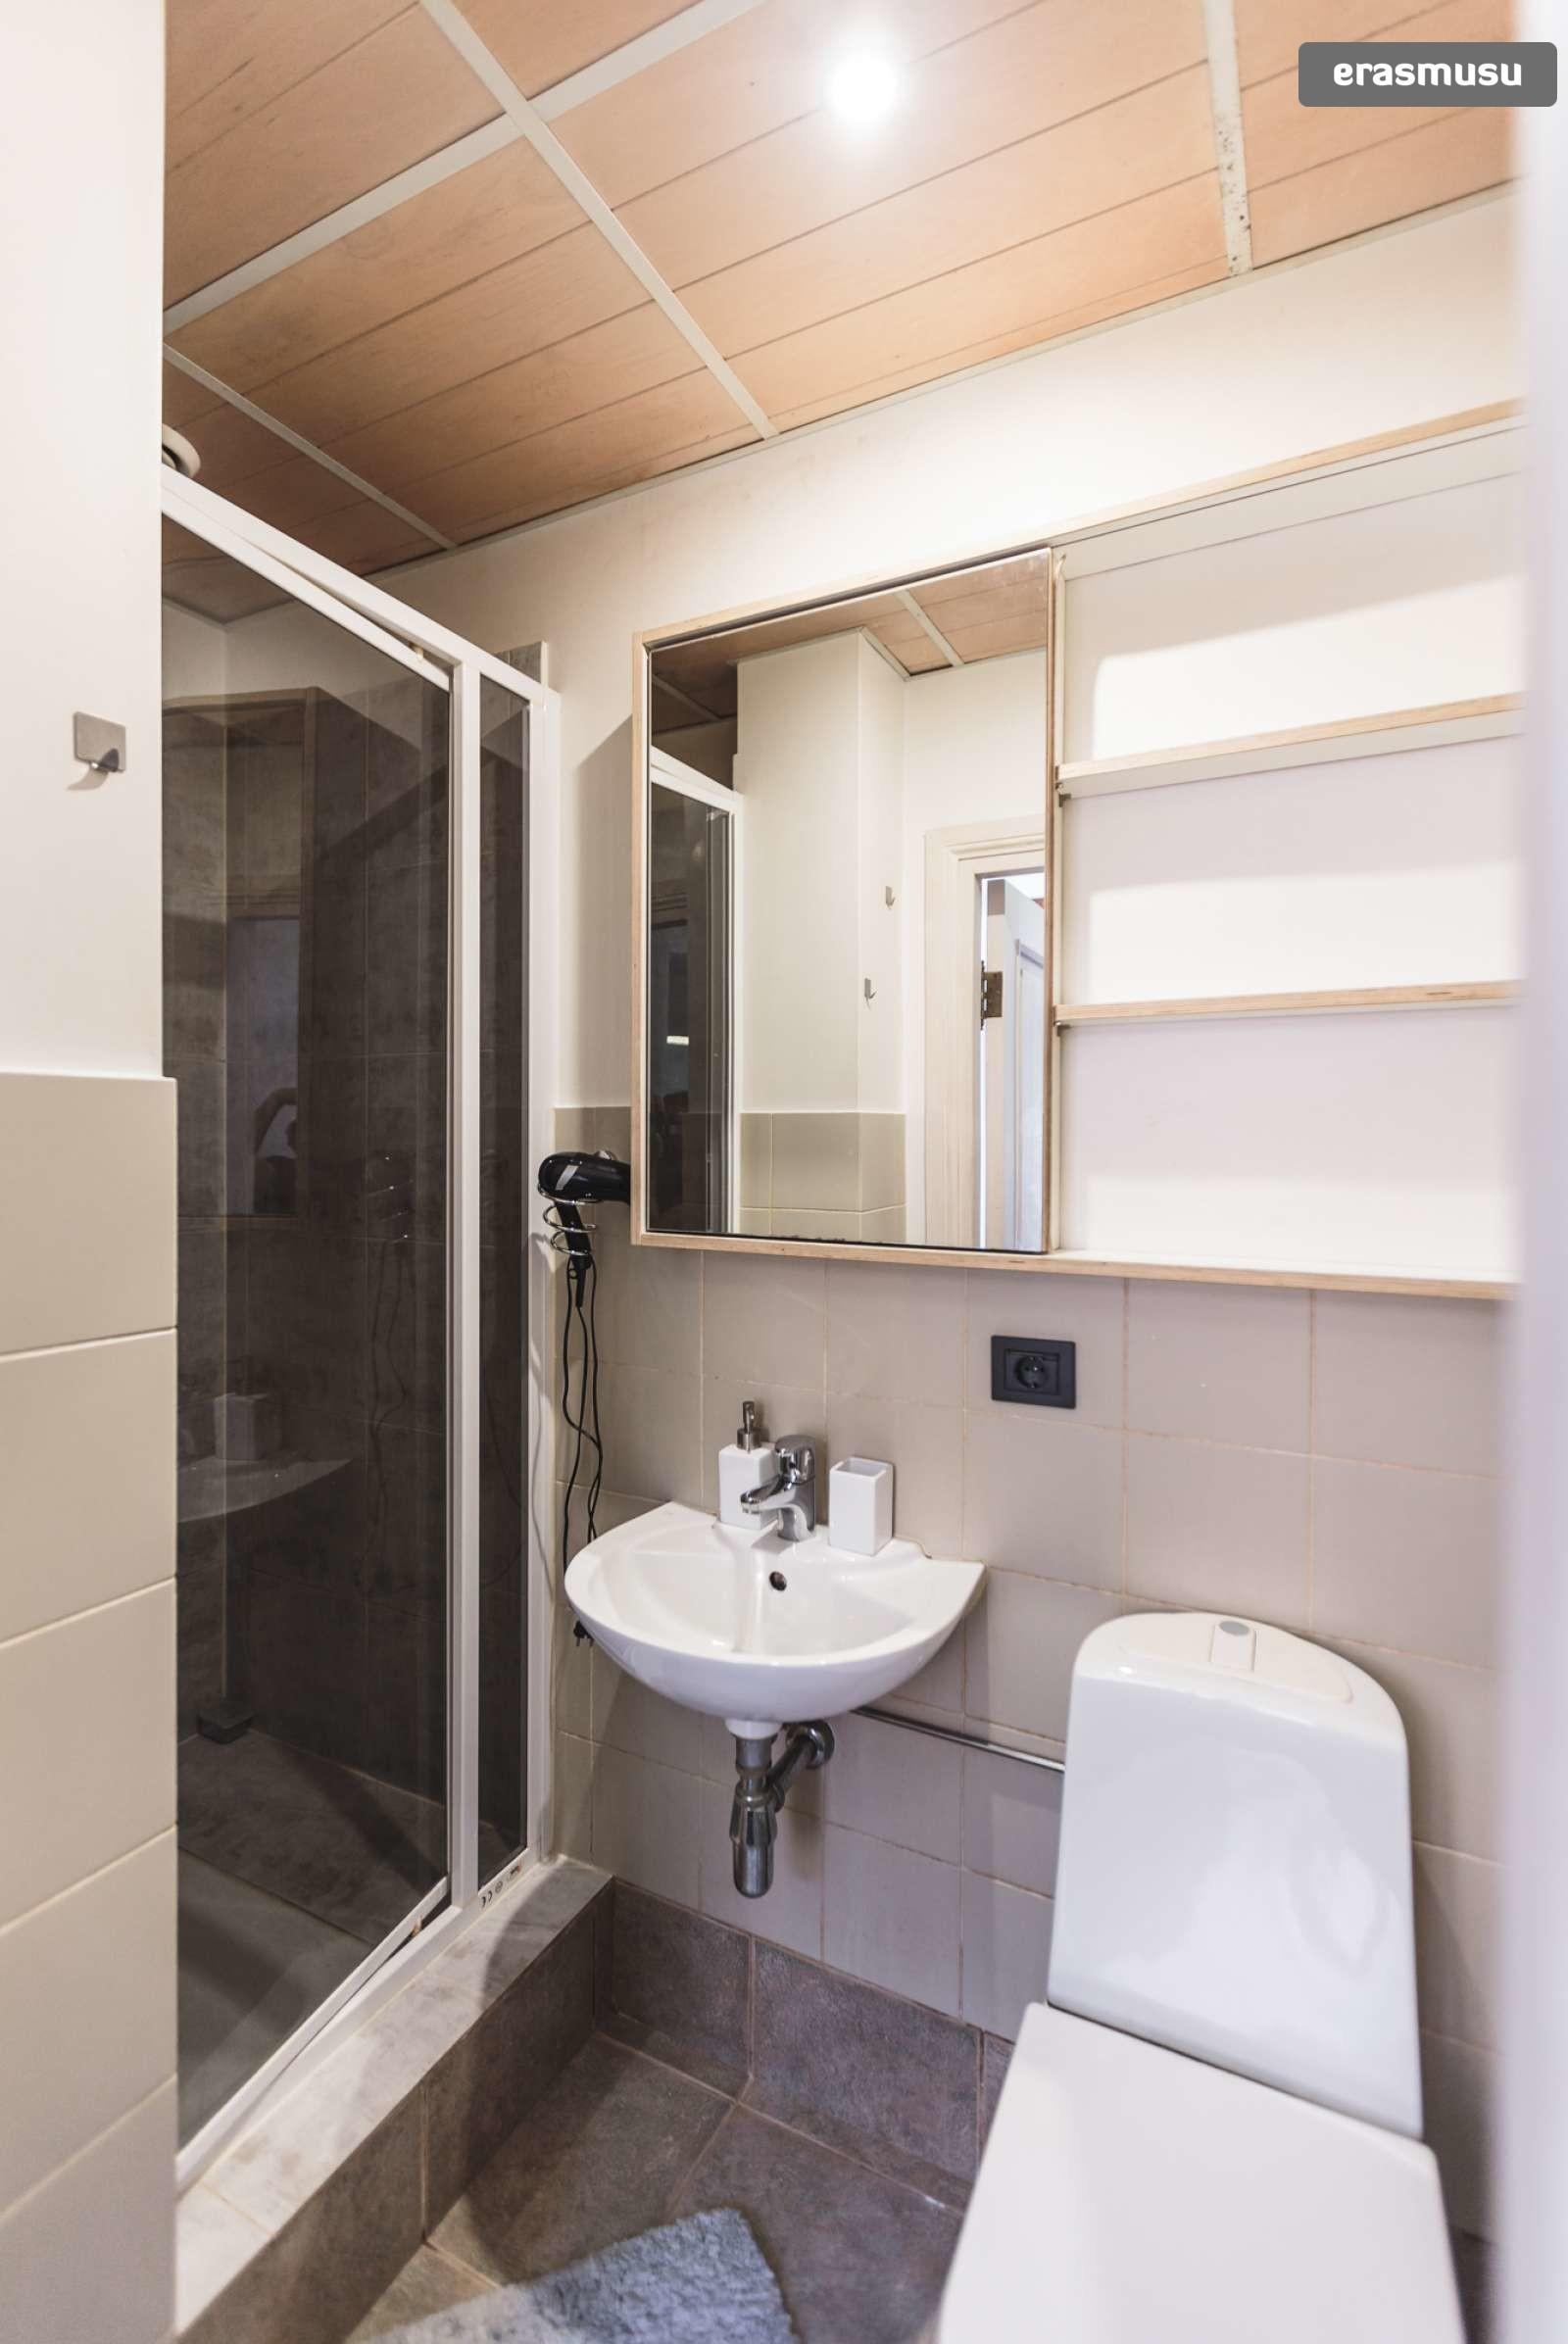 stylish-studio-apartment-rent-vecriga-48323b51f0df3e99fc4929e92d